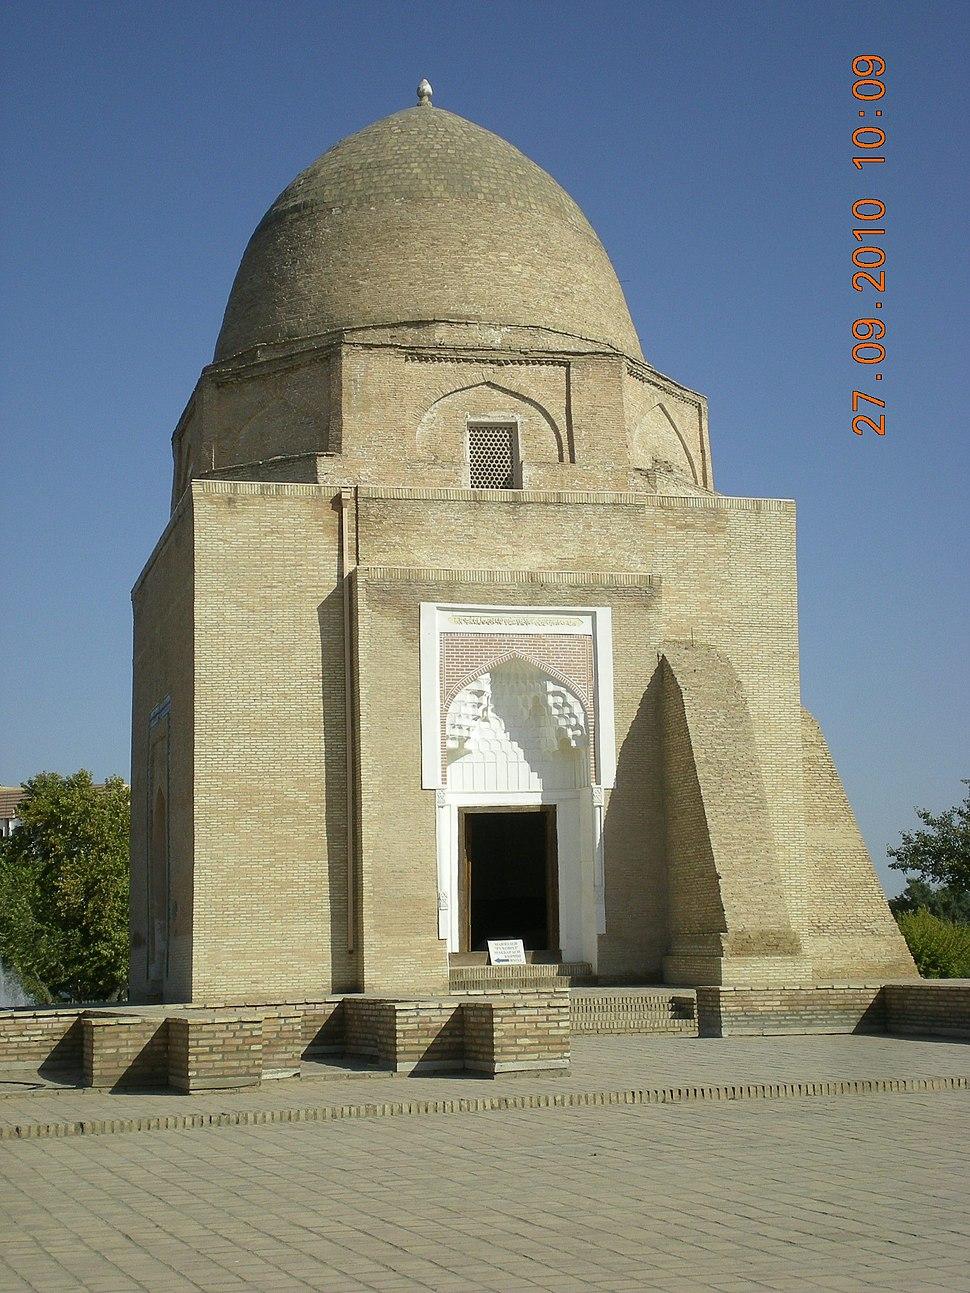 Gur-e Amir %D0%A1omplex